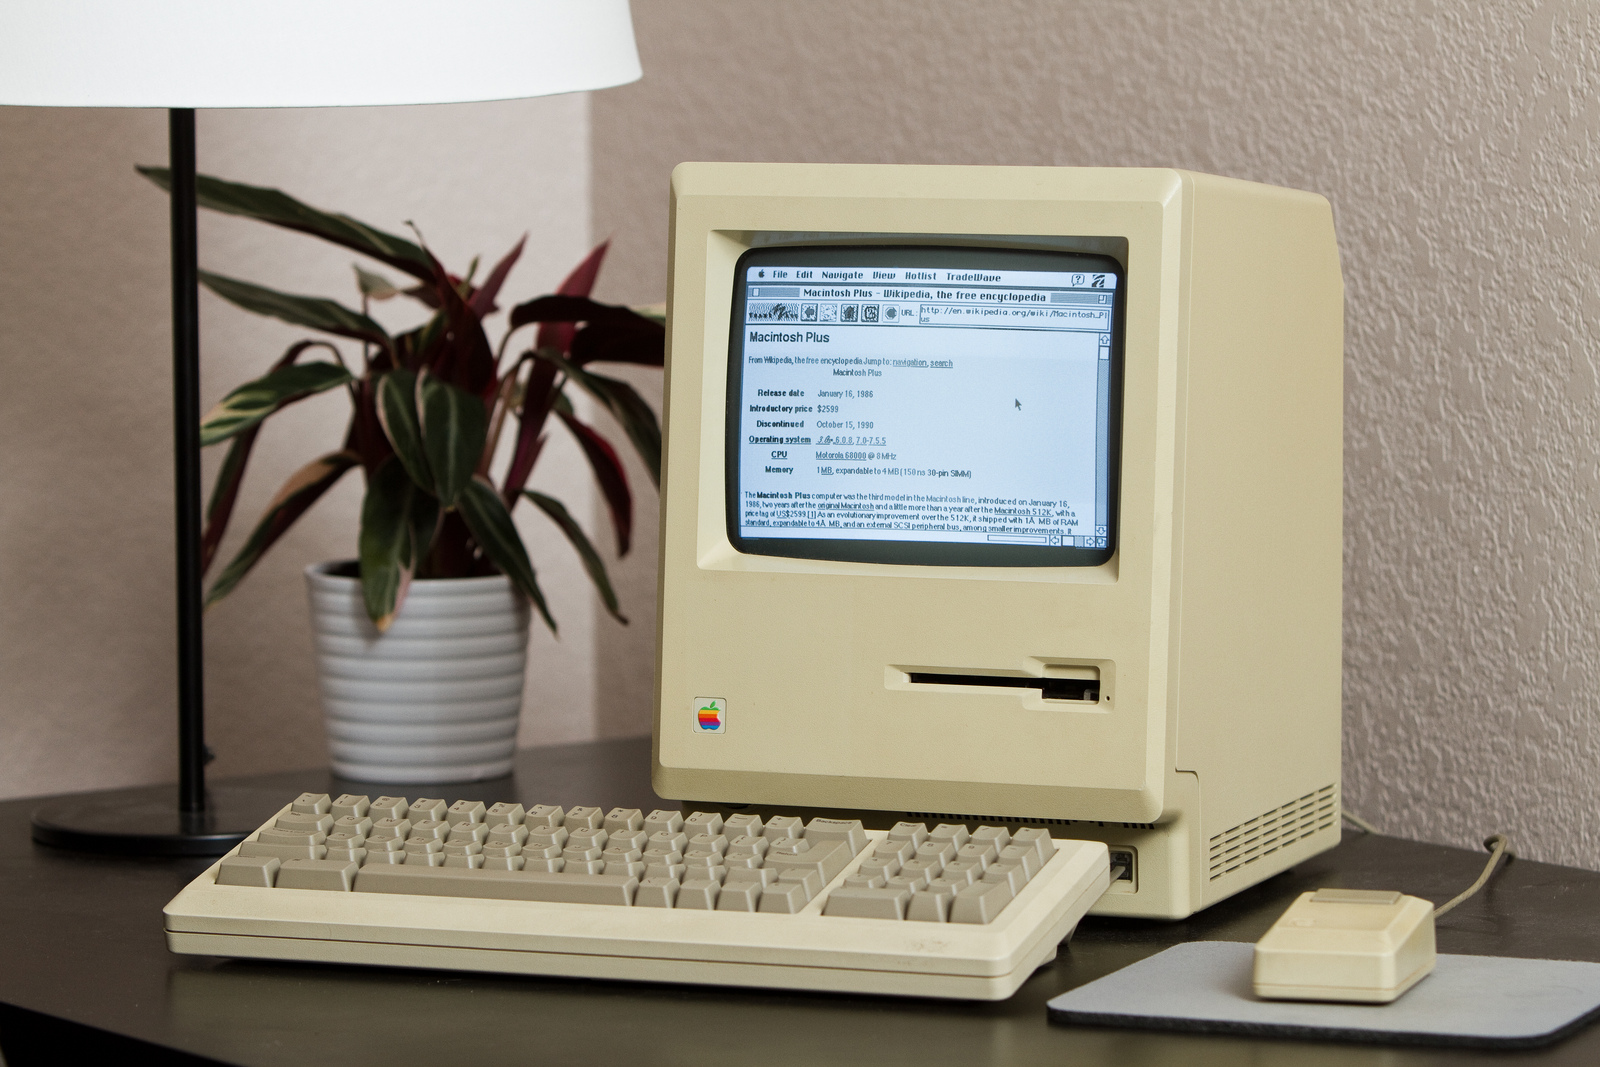 Mac Plus conectado à internet